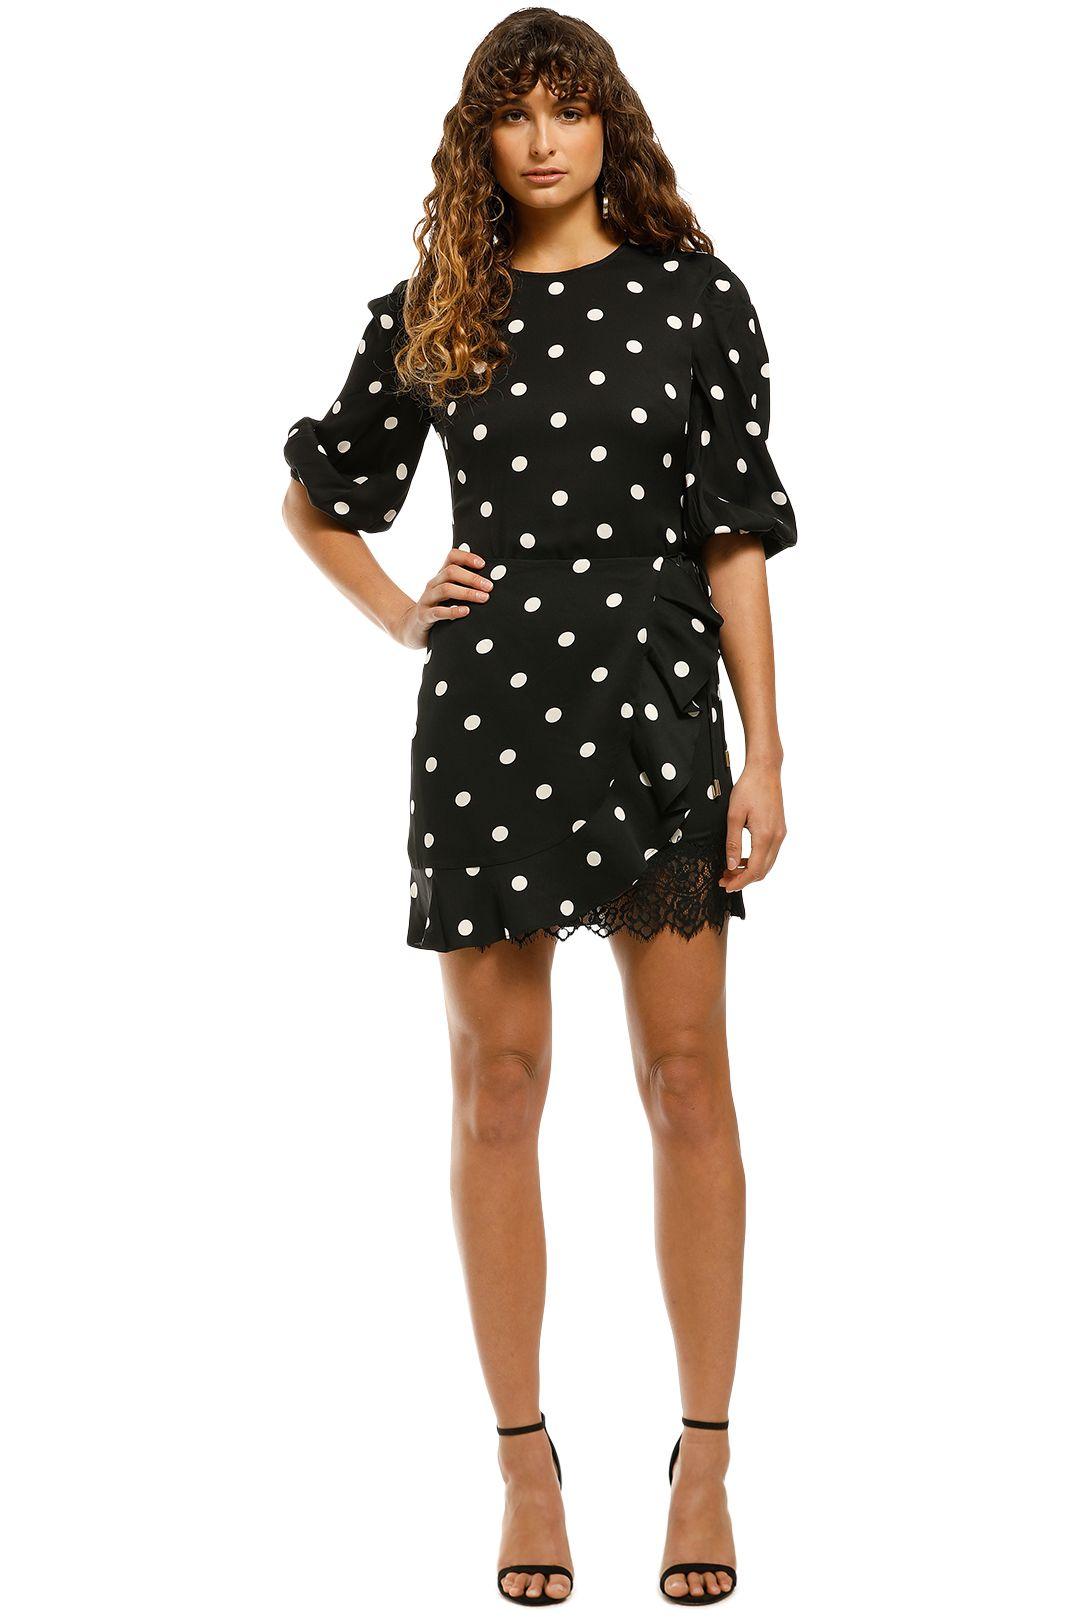 Rebecca-Vallance-Penelope-LS-Mini-Dress-Black-Spot-Front